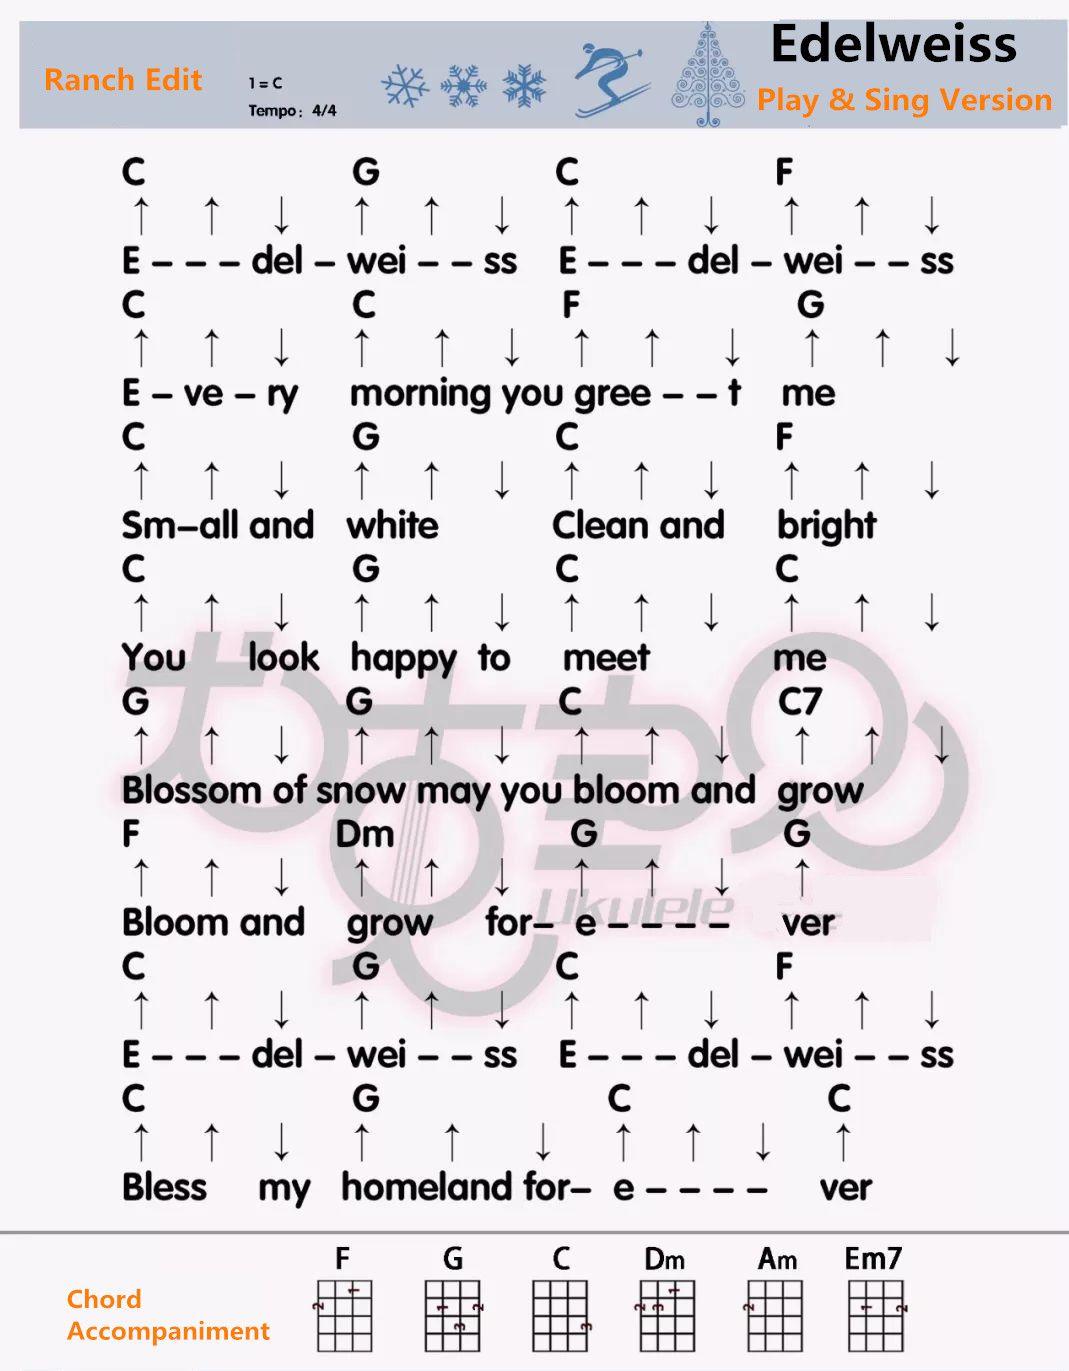 Edelweiss Ukulele Sheet Play Sing Version Ranch Edit Ukulele